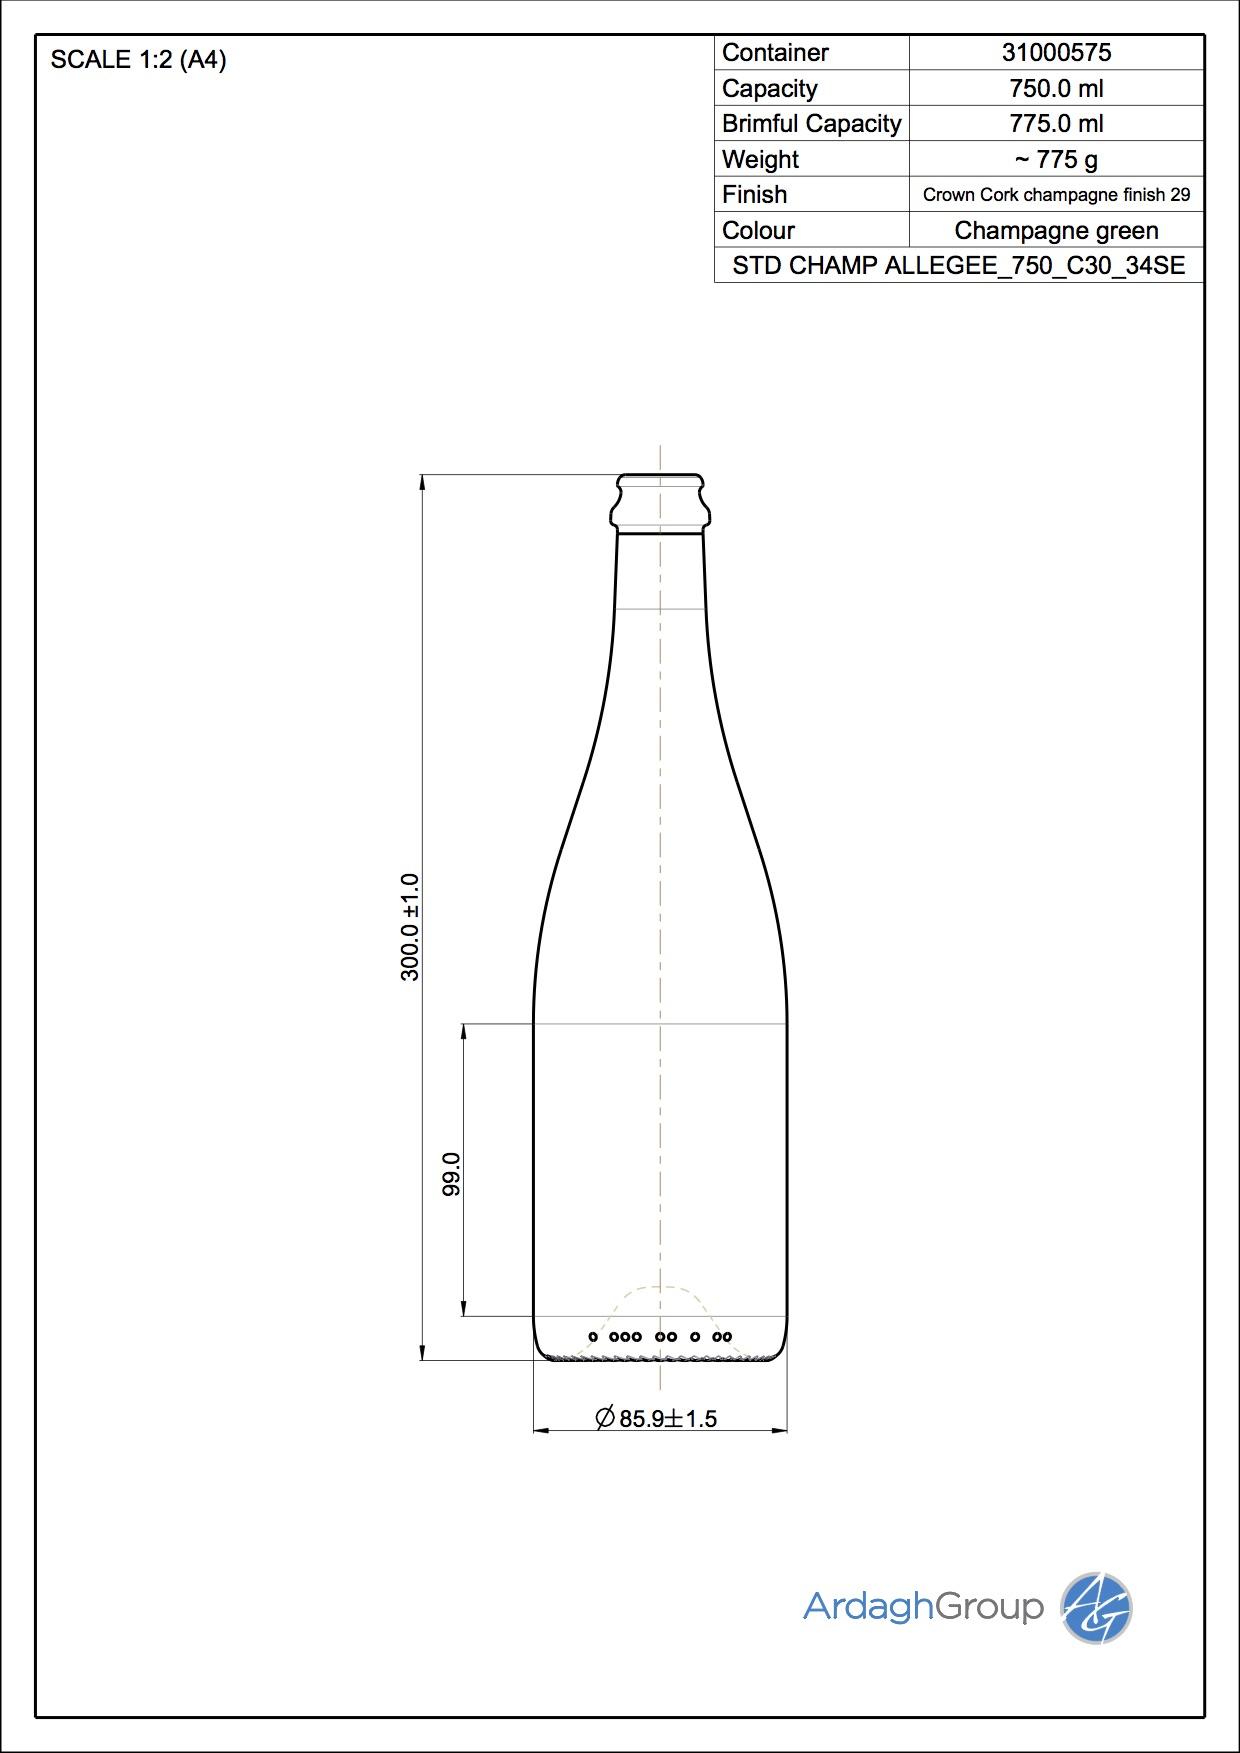 750ml flint glass Champ Allegee oneway wine bottle